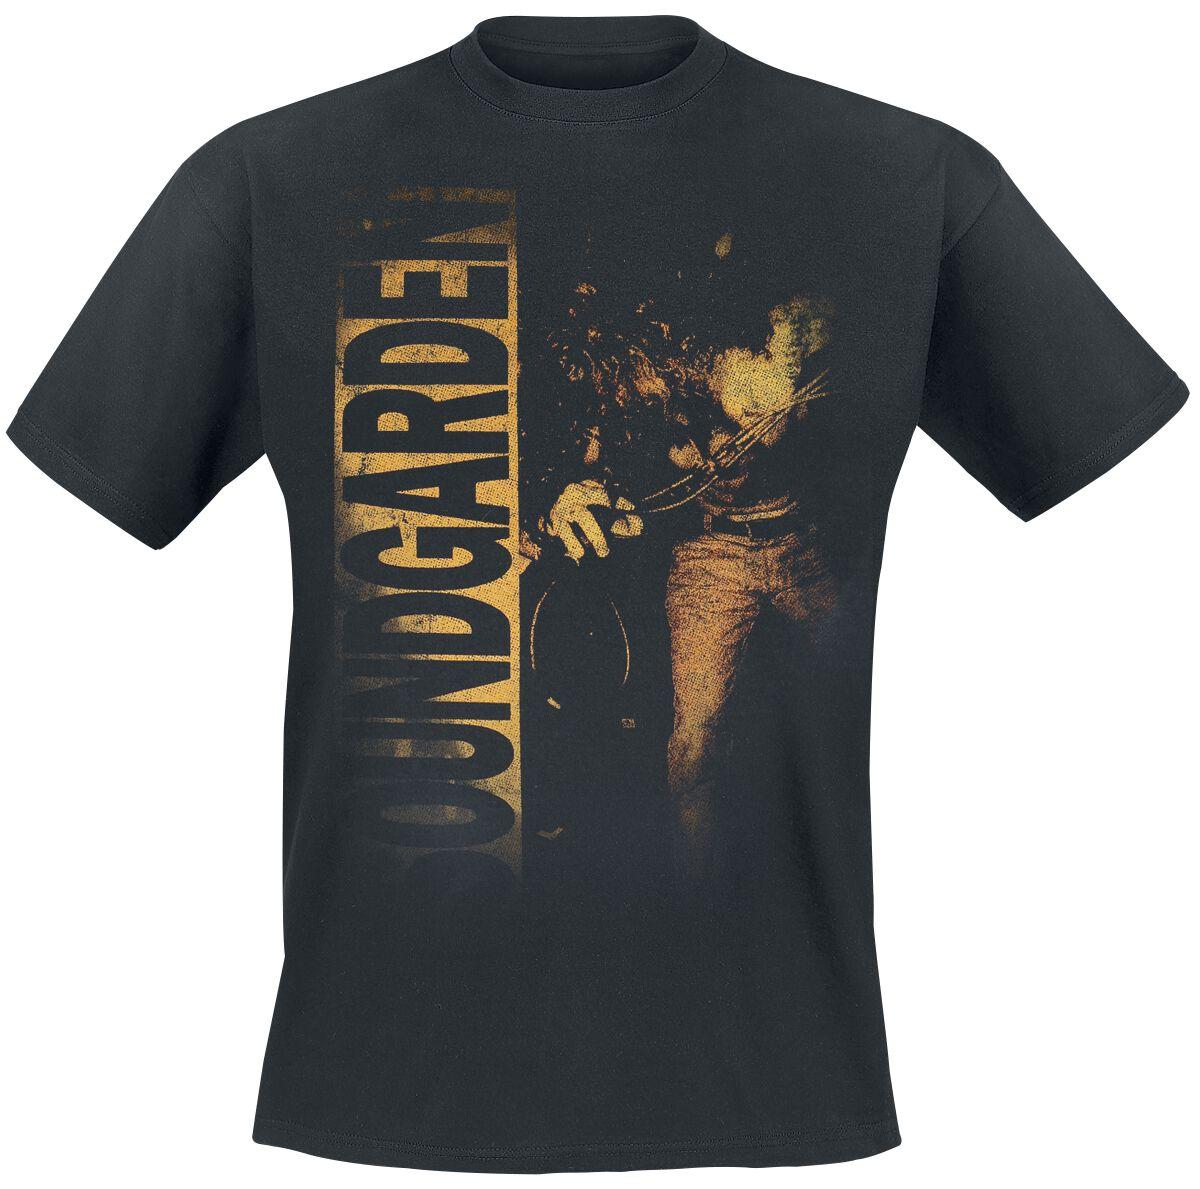 Zespoły - Koszulki - T-Shirt Soundgarden Louder Than Love T-Shirt czarny - 356876